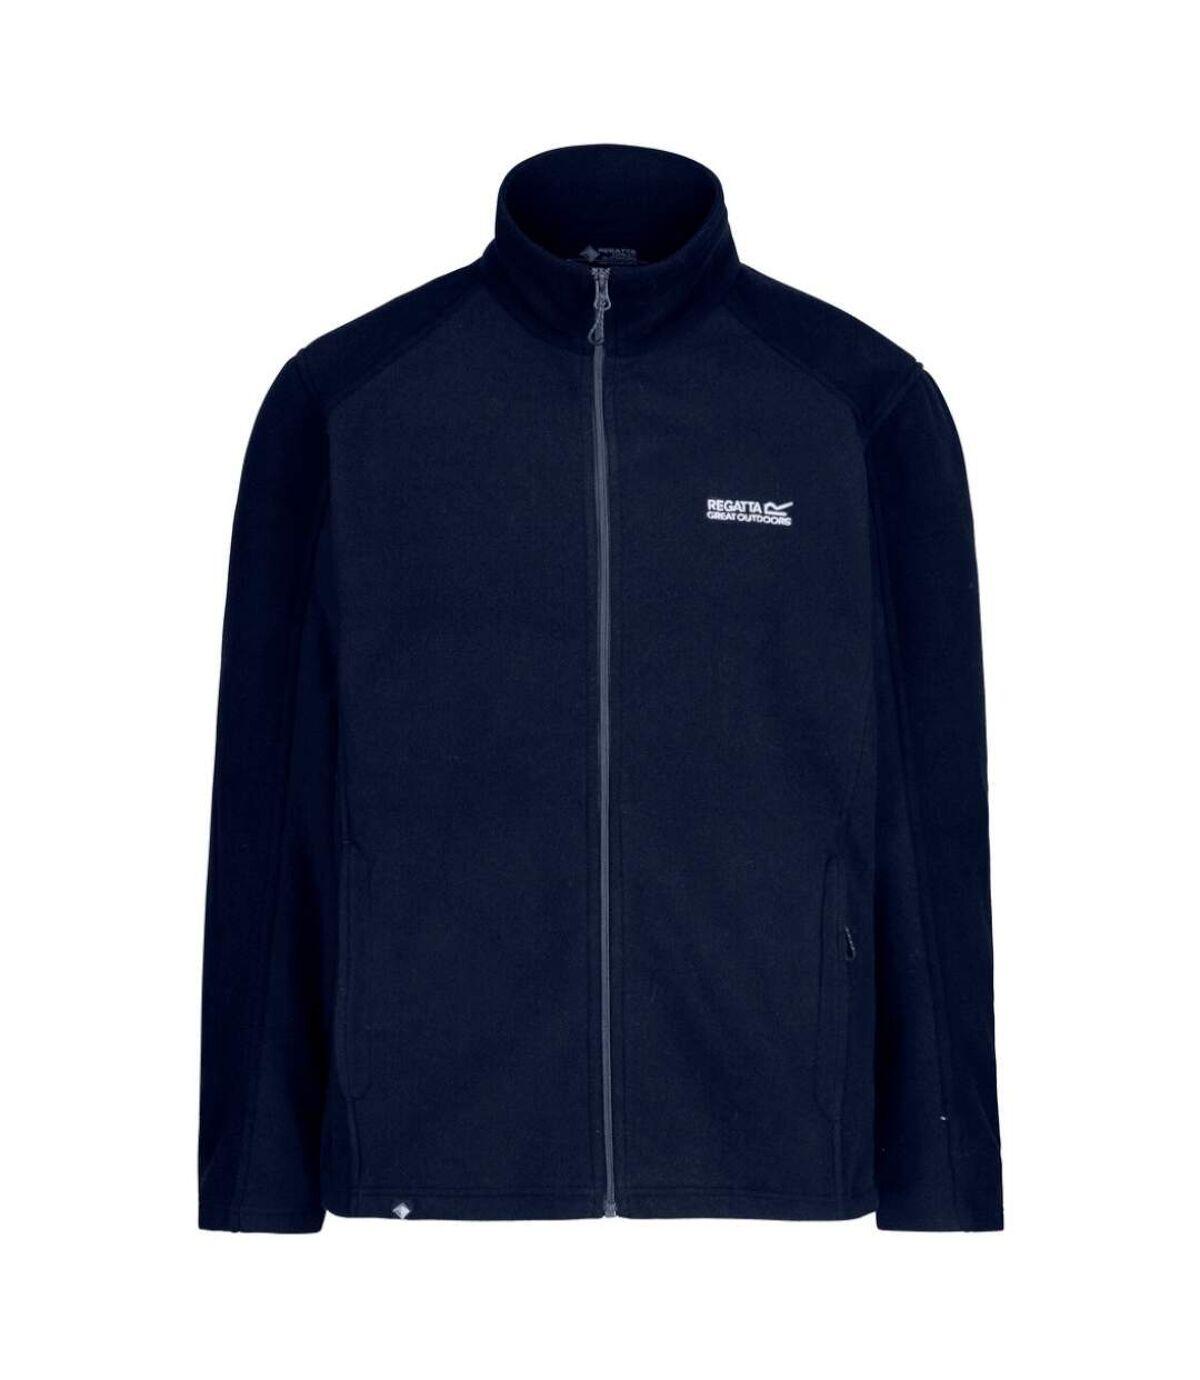 Regatta - Veste polaire HEDMAN - Homme (Bleu marine) - UTRG1398